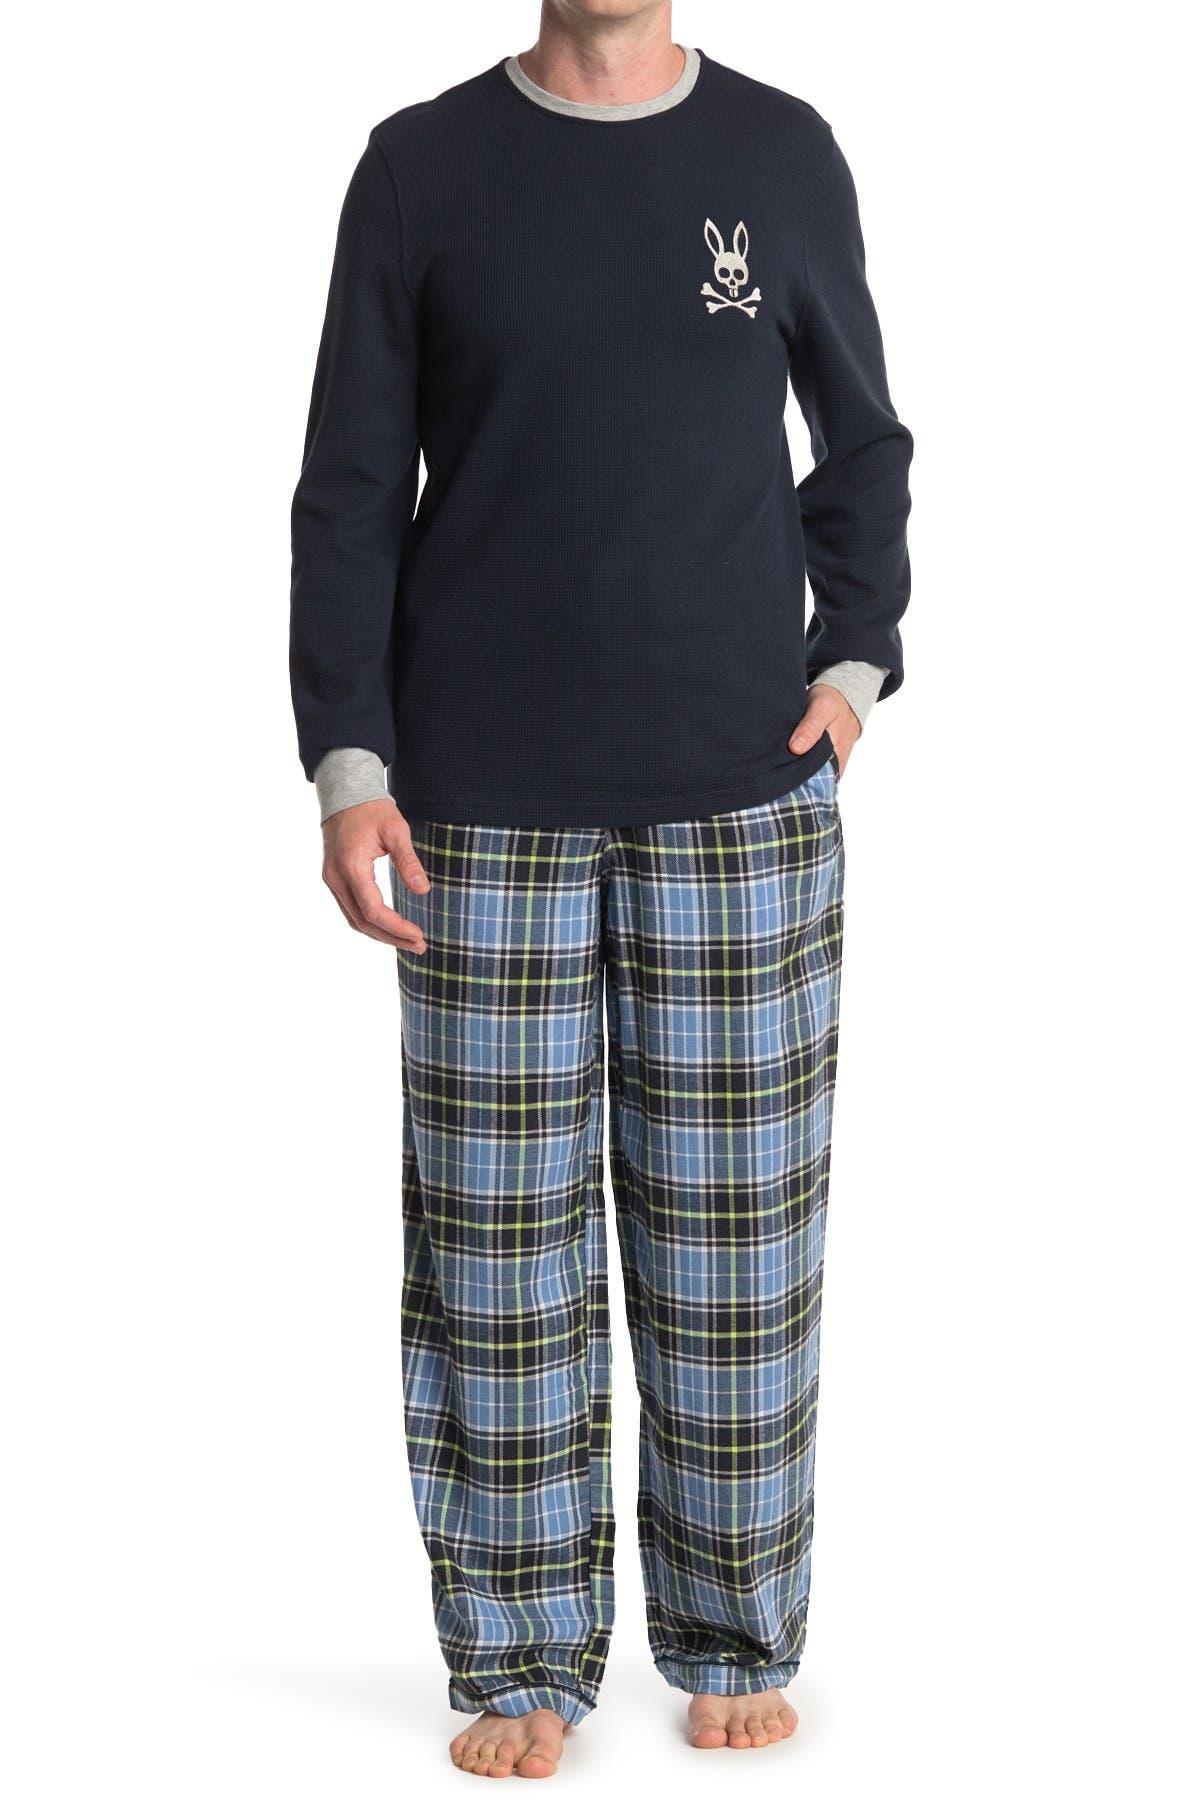 PSYCHO BUNNY Waffle Knit Bunny Lounge Long Sleeve Shirt NEW NWT